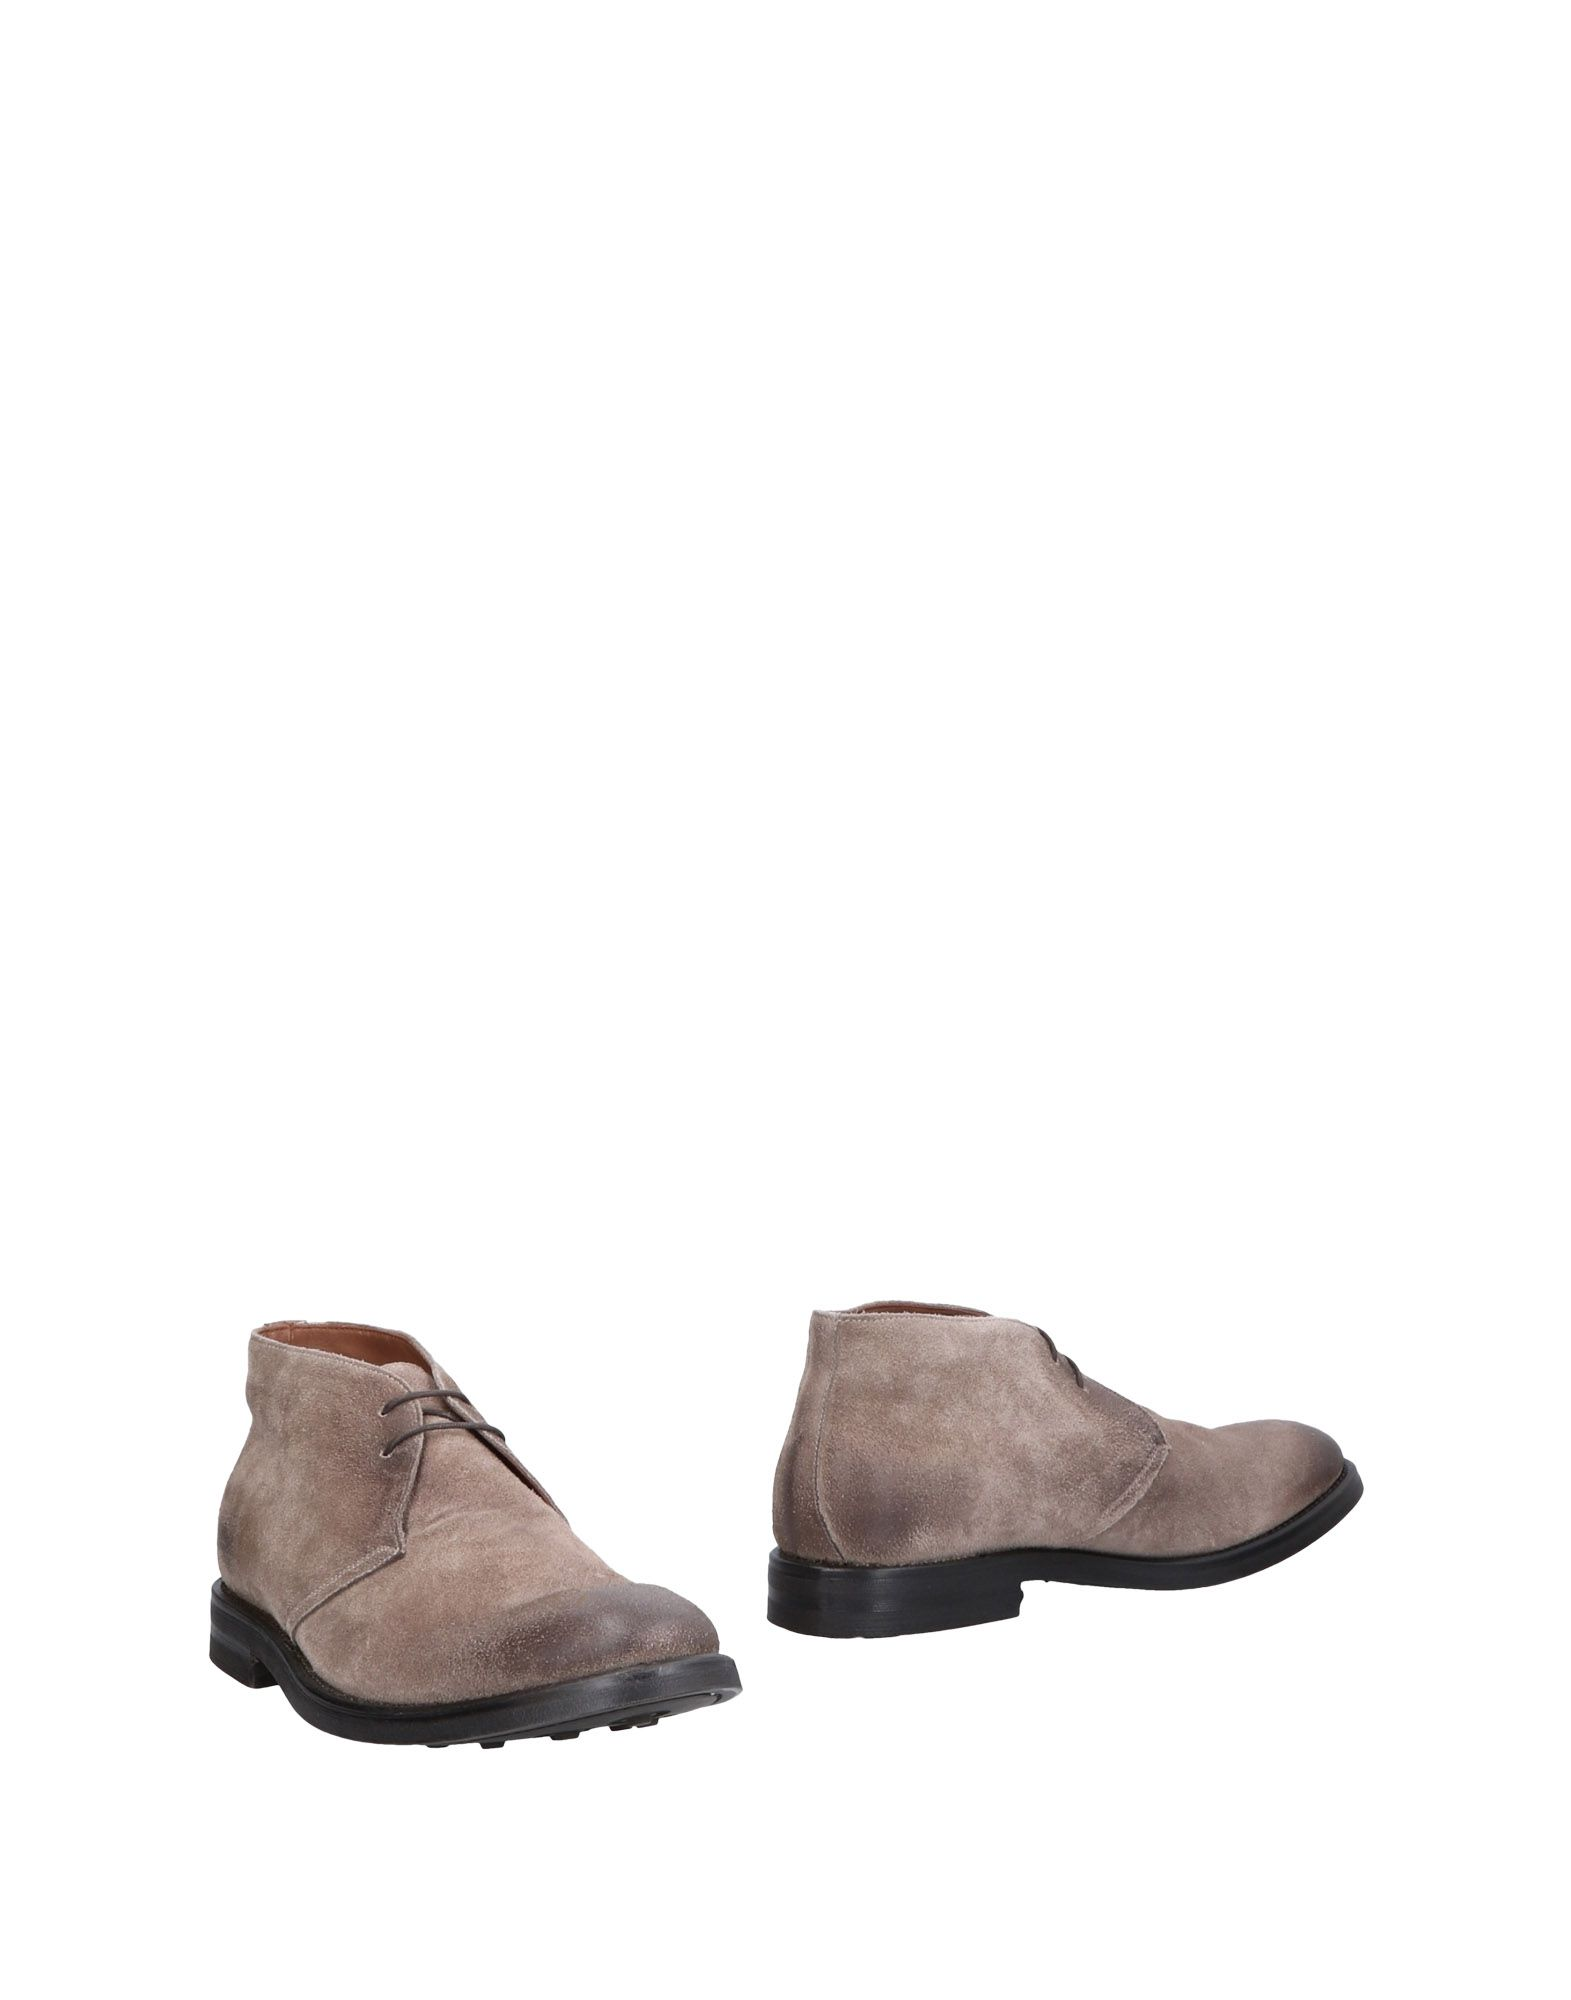 MIGLIORE Полусапоги и высокие ботинки сушилка migliore plus 987578